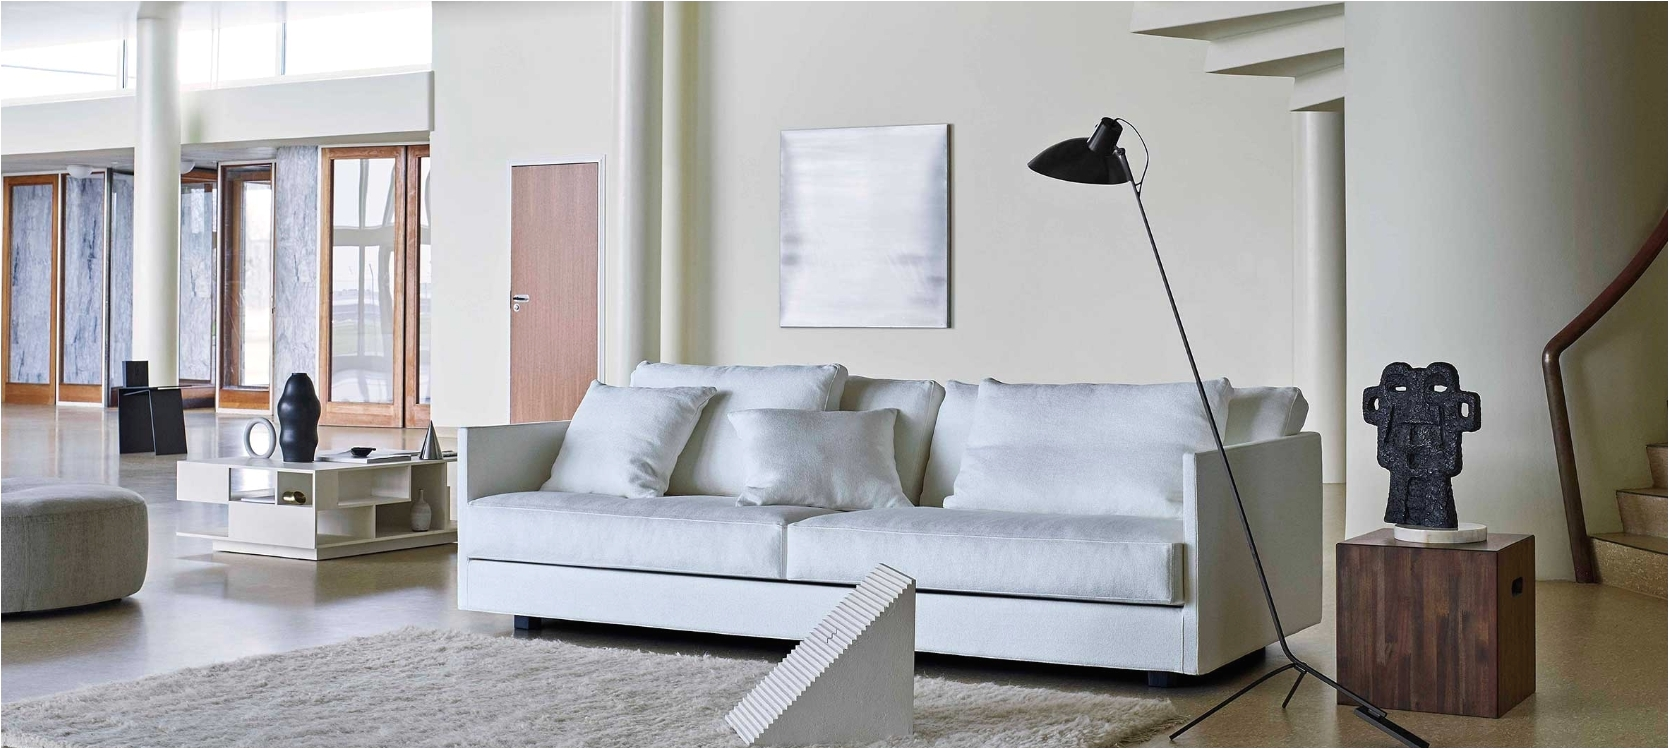 ajour sofa by eilersen scandinavian design 820 manhattan ave 11222